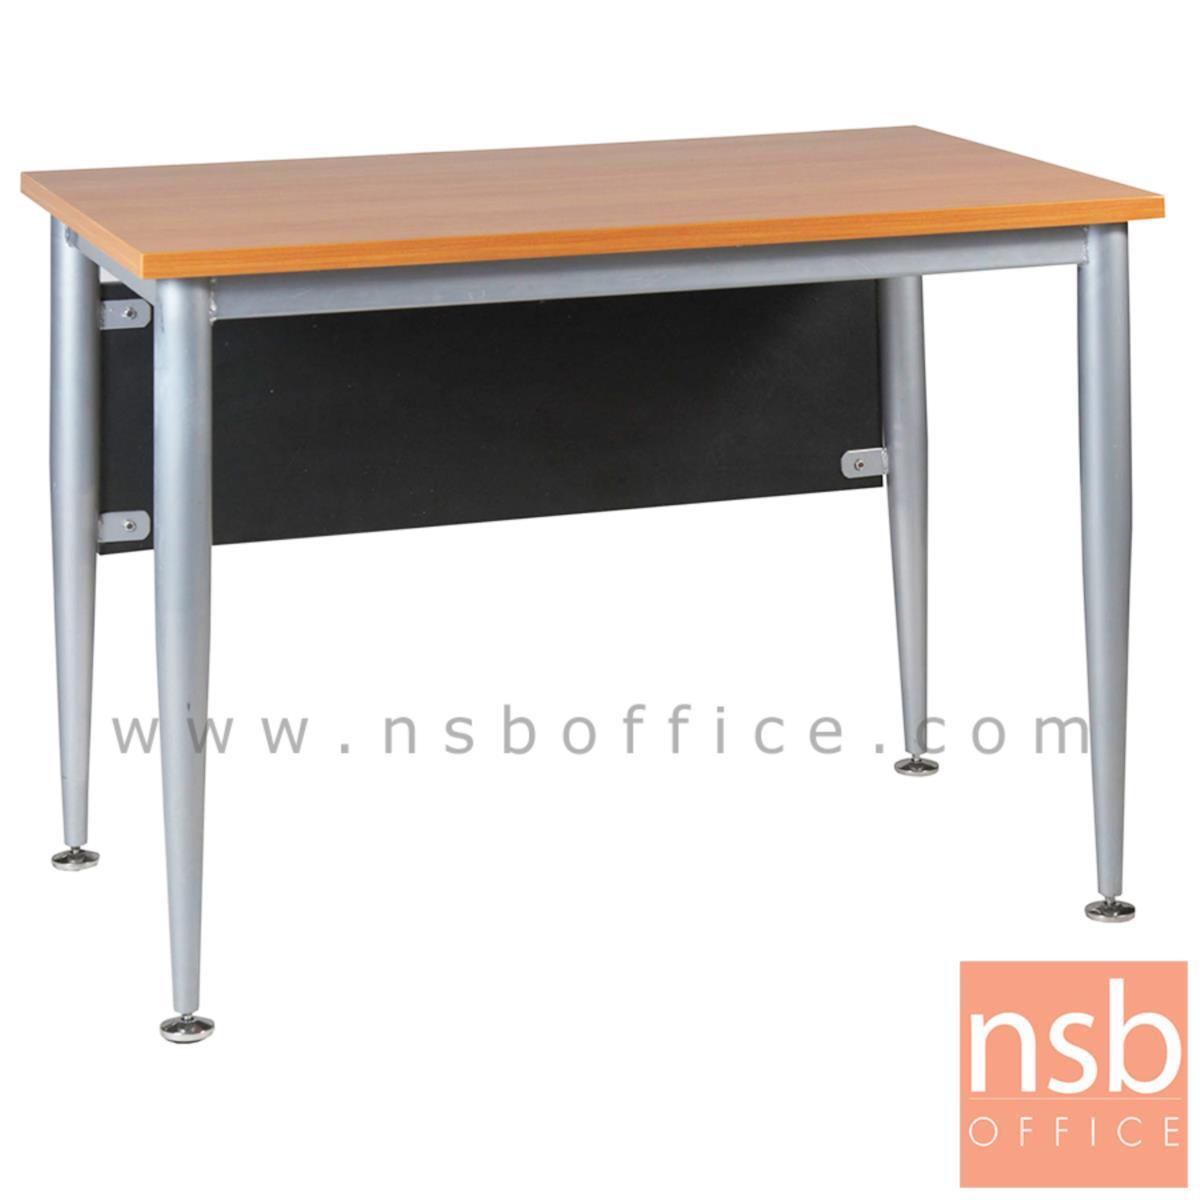 A07A044:โต๊ะทำงาน บังโป๊ดำ รุ่น FPF-18 ขนาด 120W ,150W ,180W cm. ขาเหล็กพ่นบอร์นเงิน